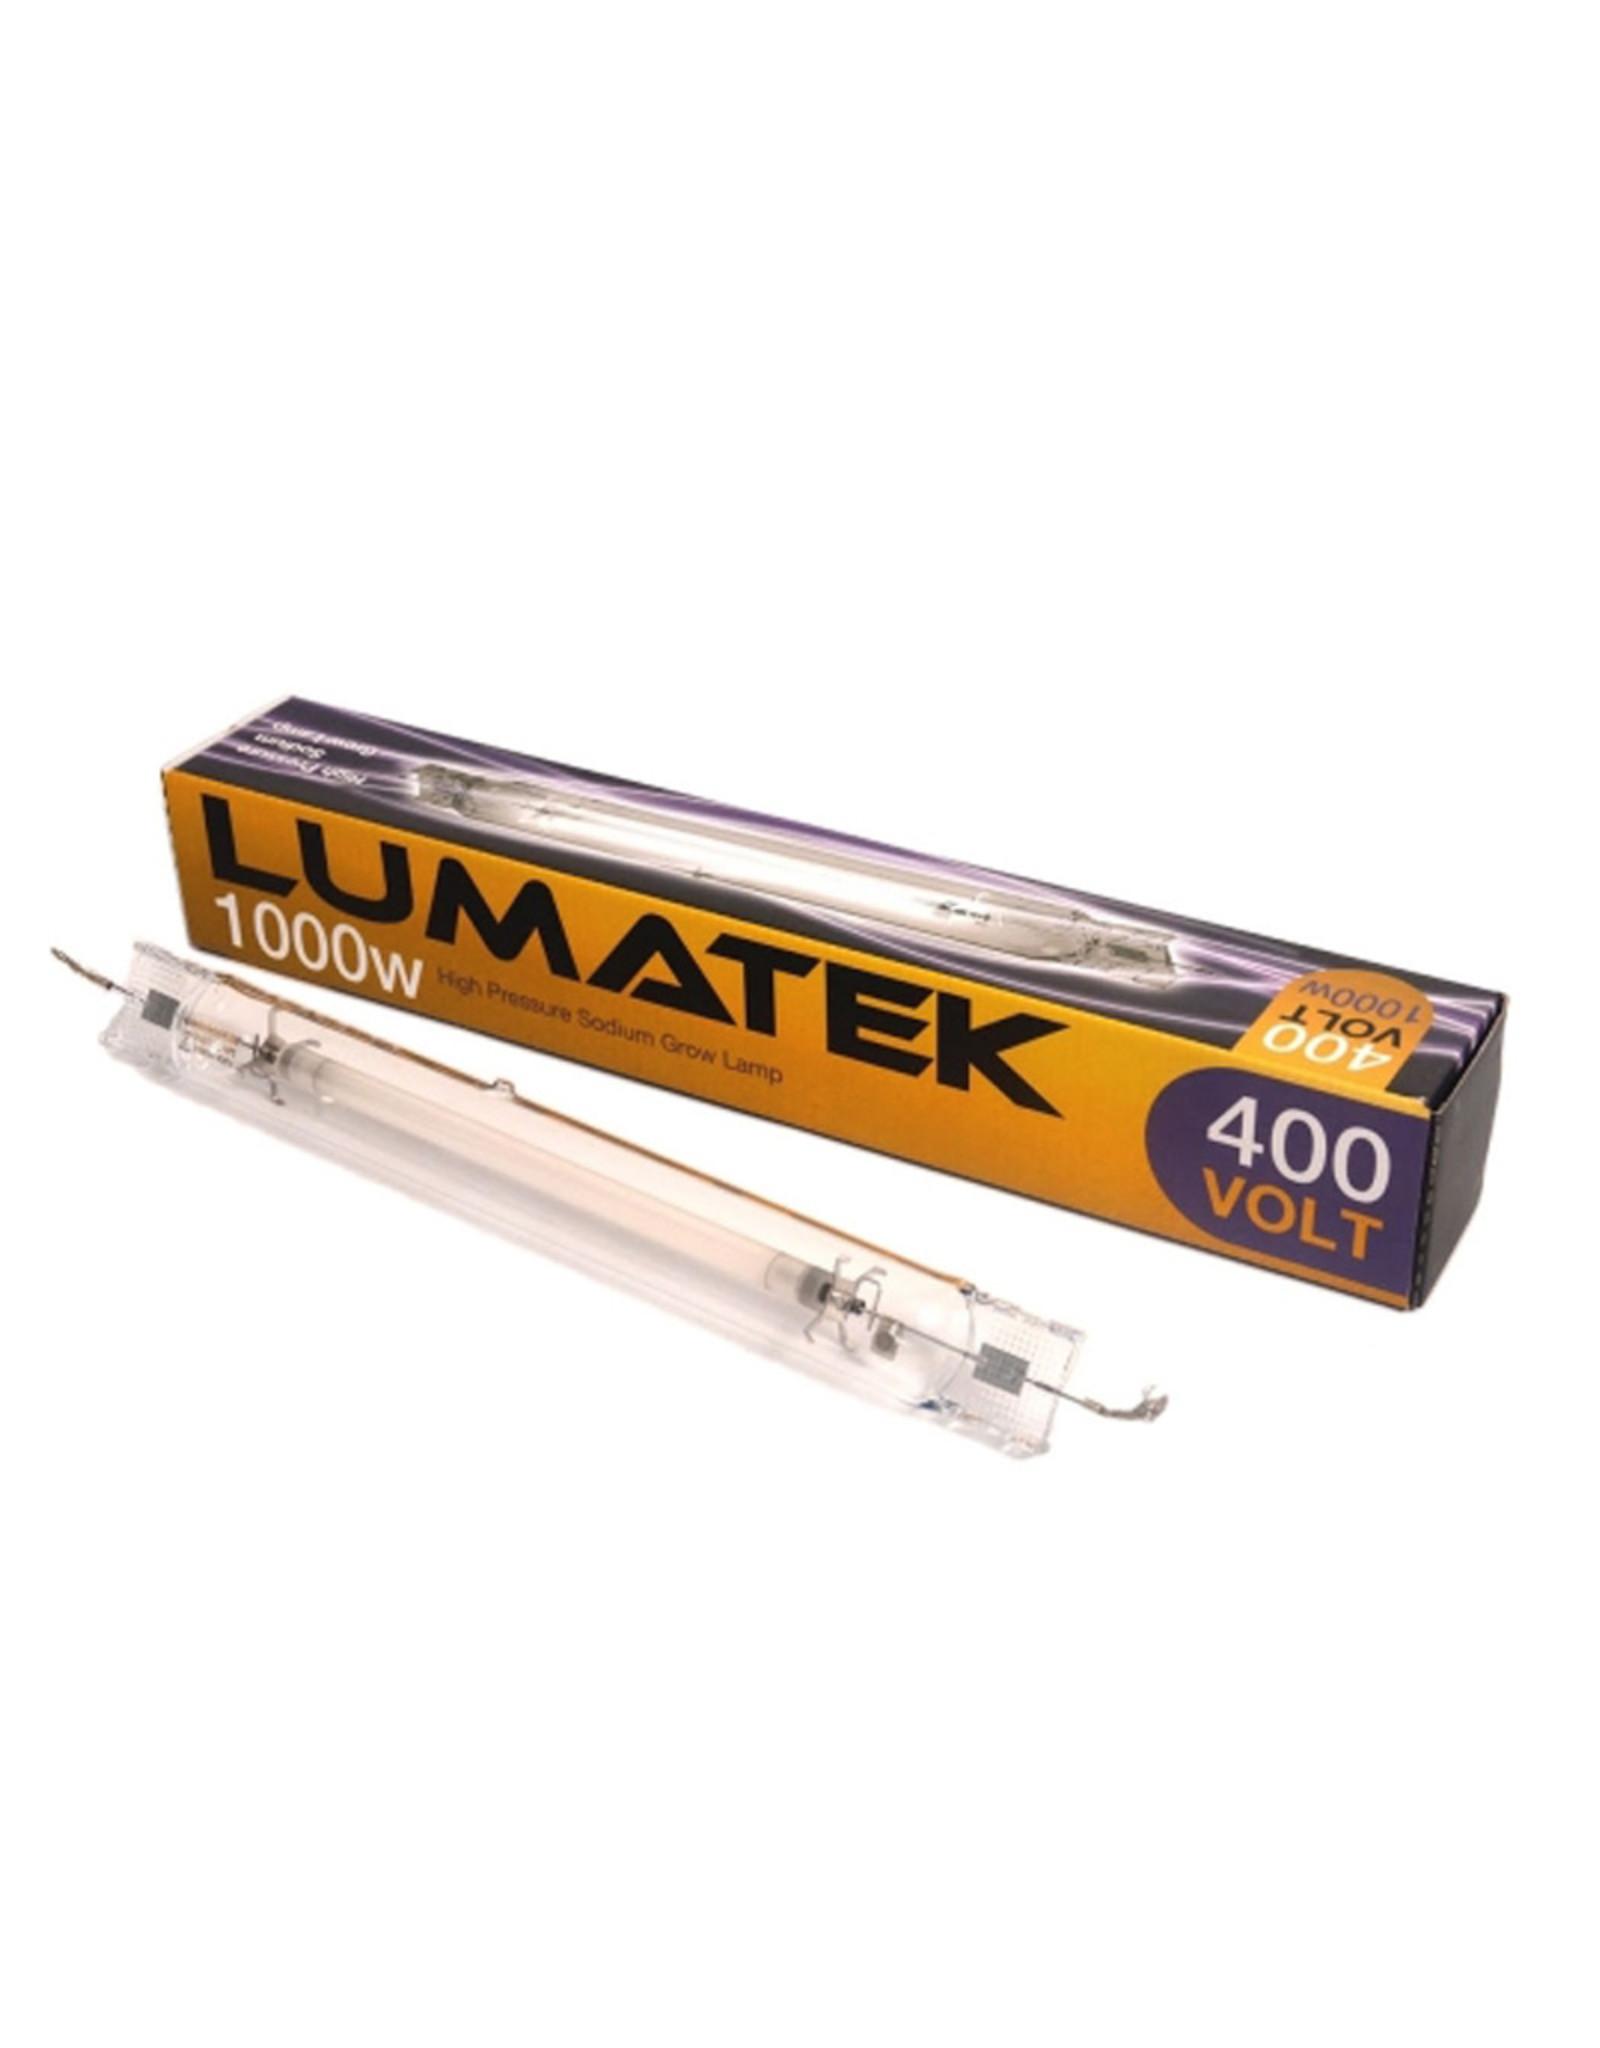 LUMATEK LUMATEK 1000W 400V PRO DE DOUBLE ENDED LAMP